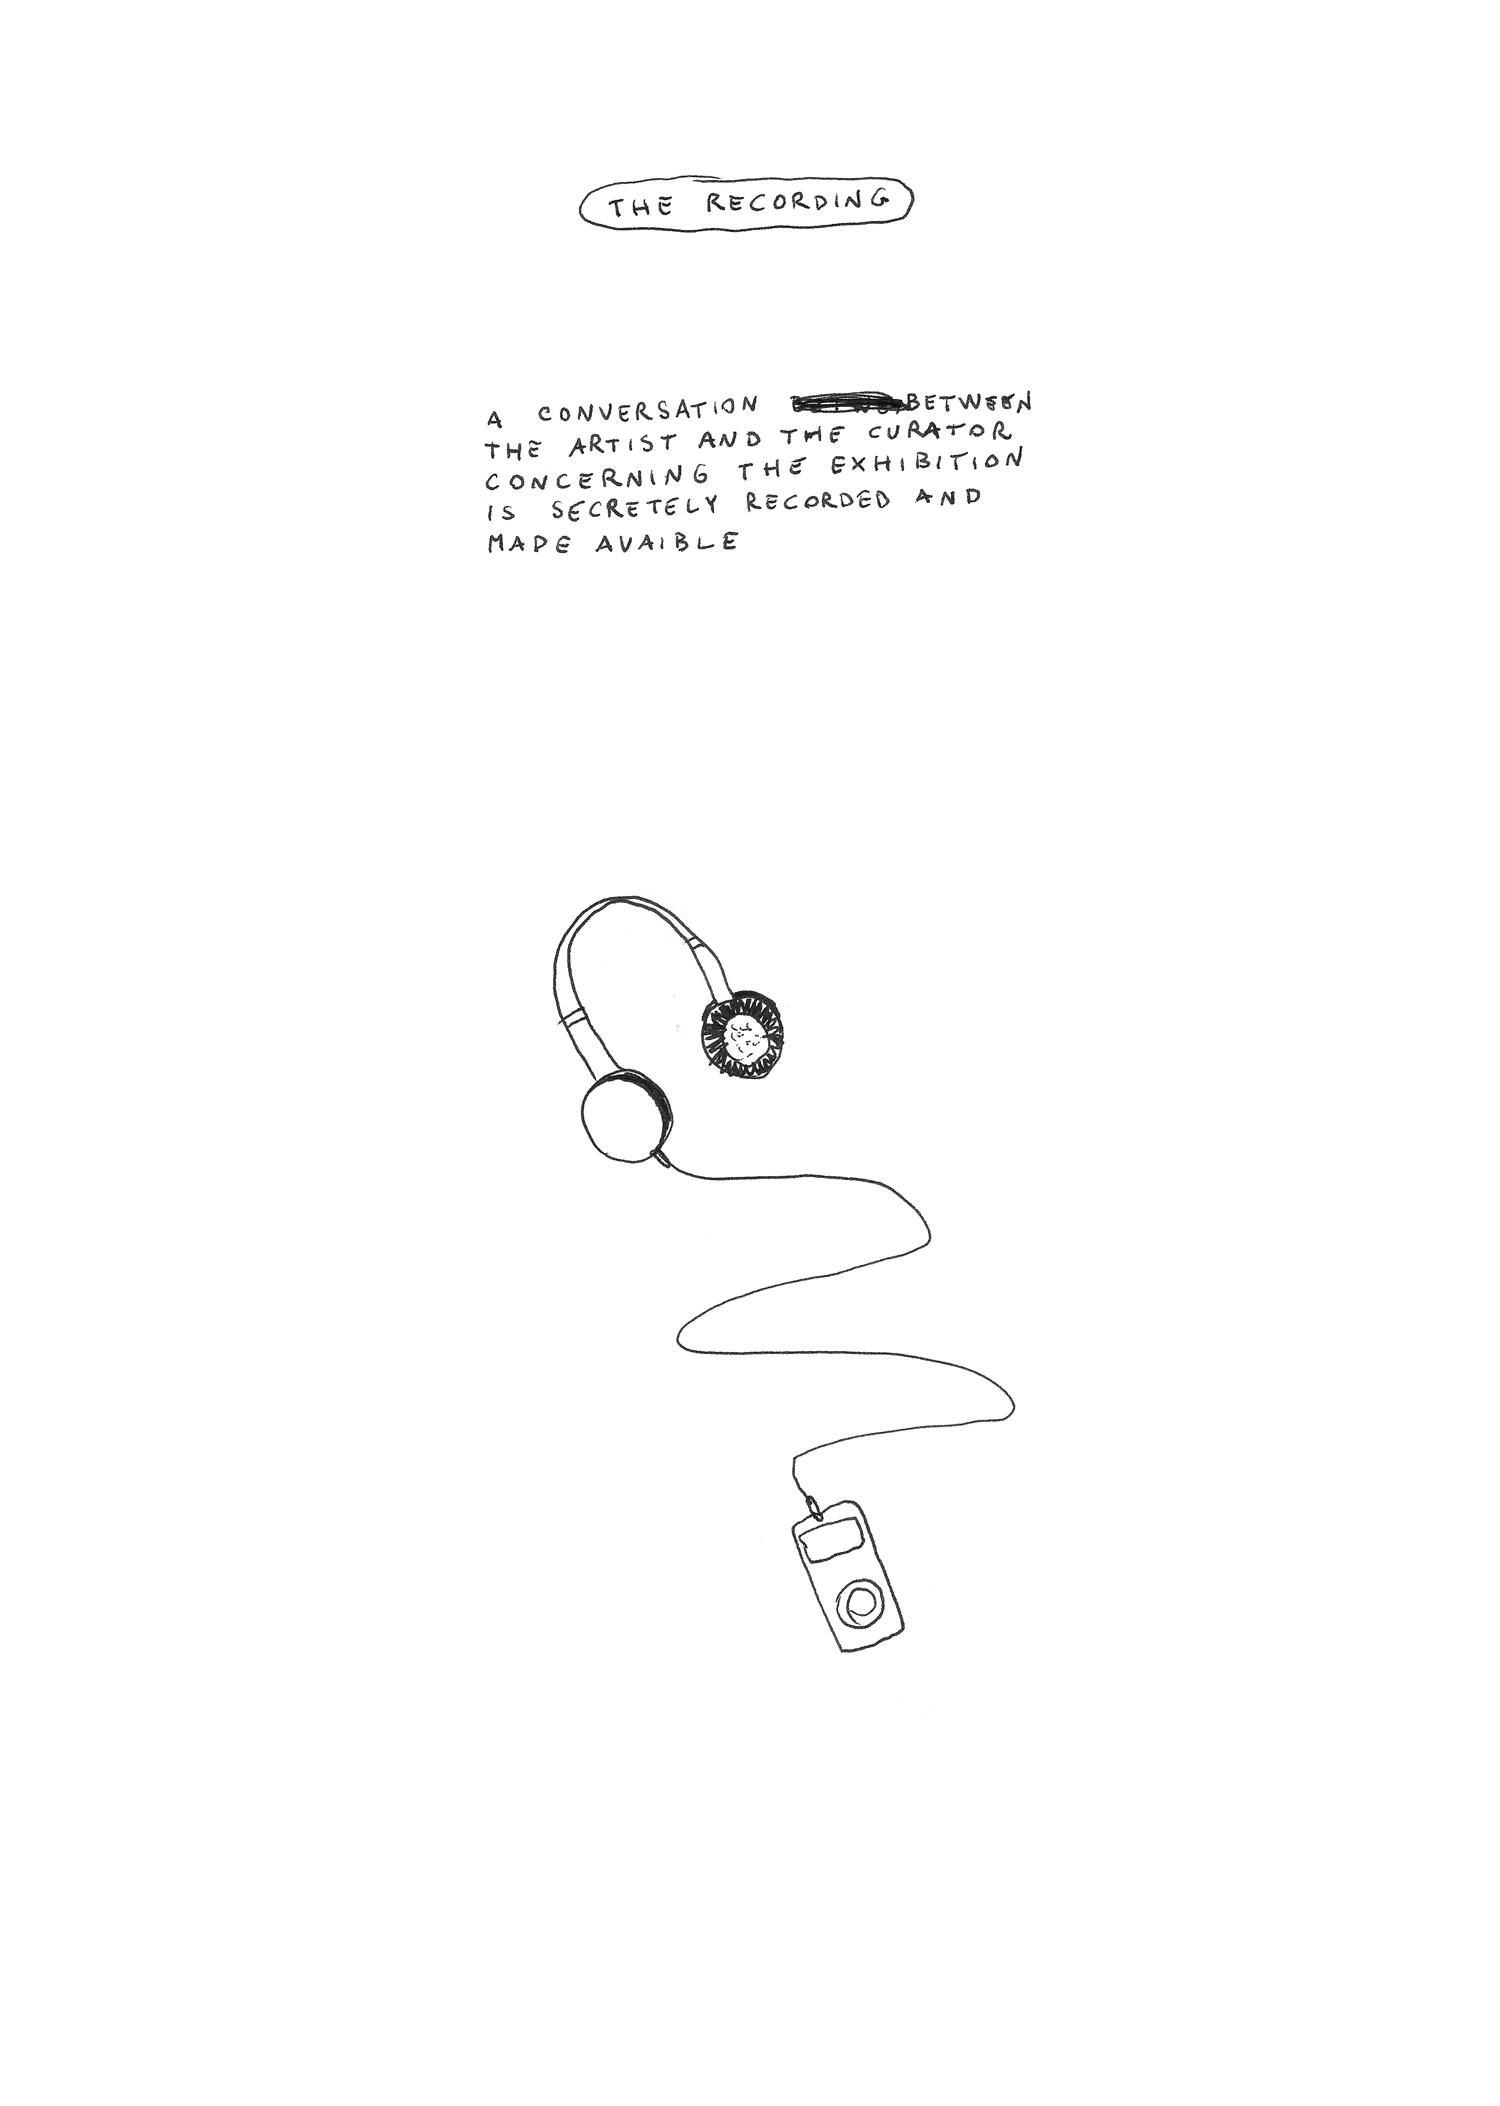 1the recording